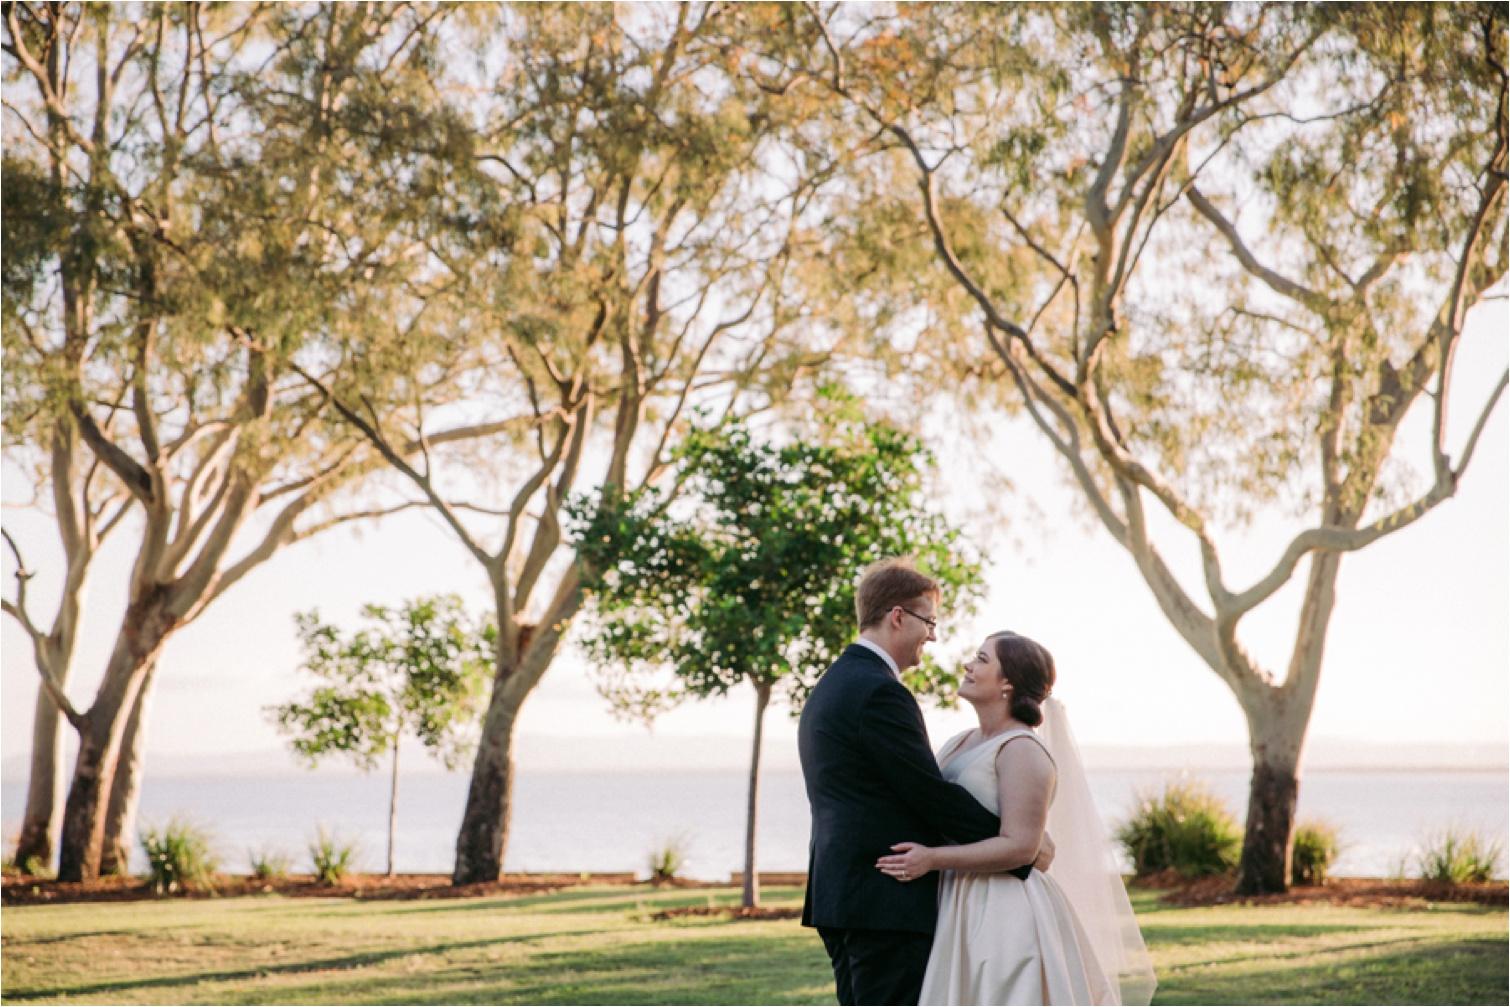 Bribie_Island_Wedding_Photography_0070.jpg